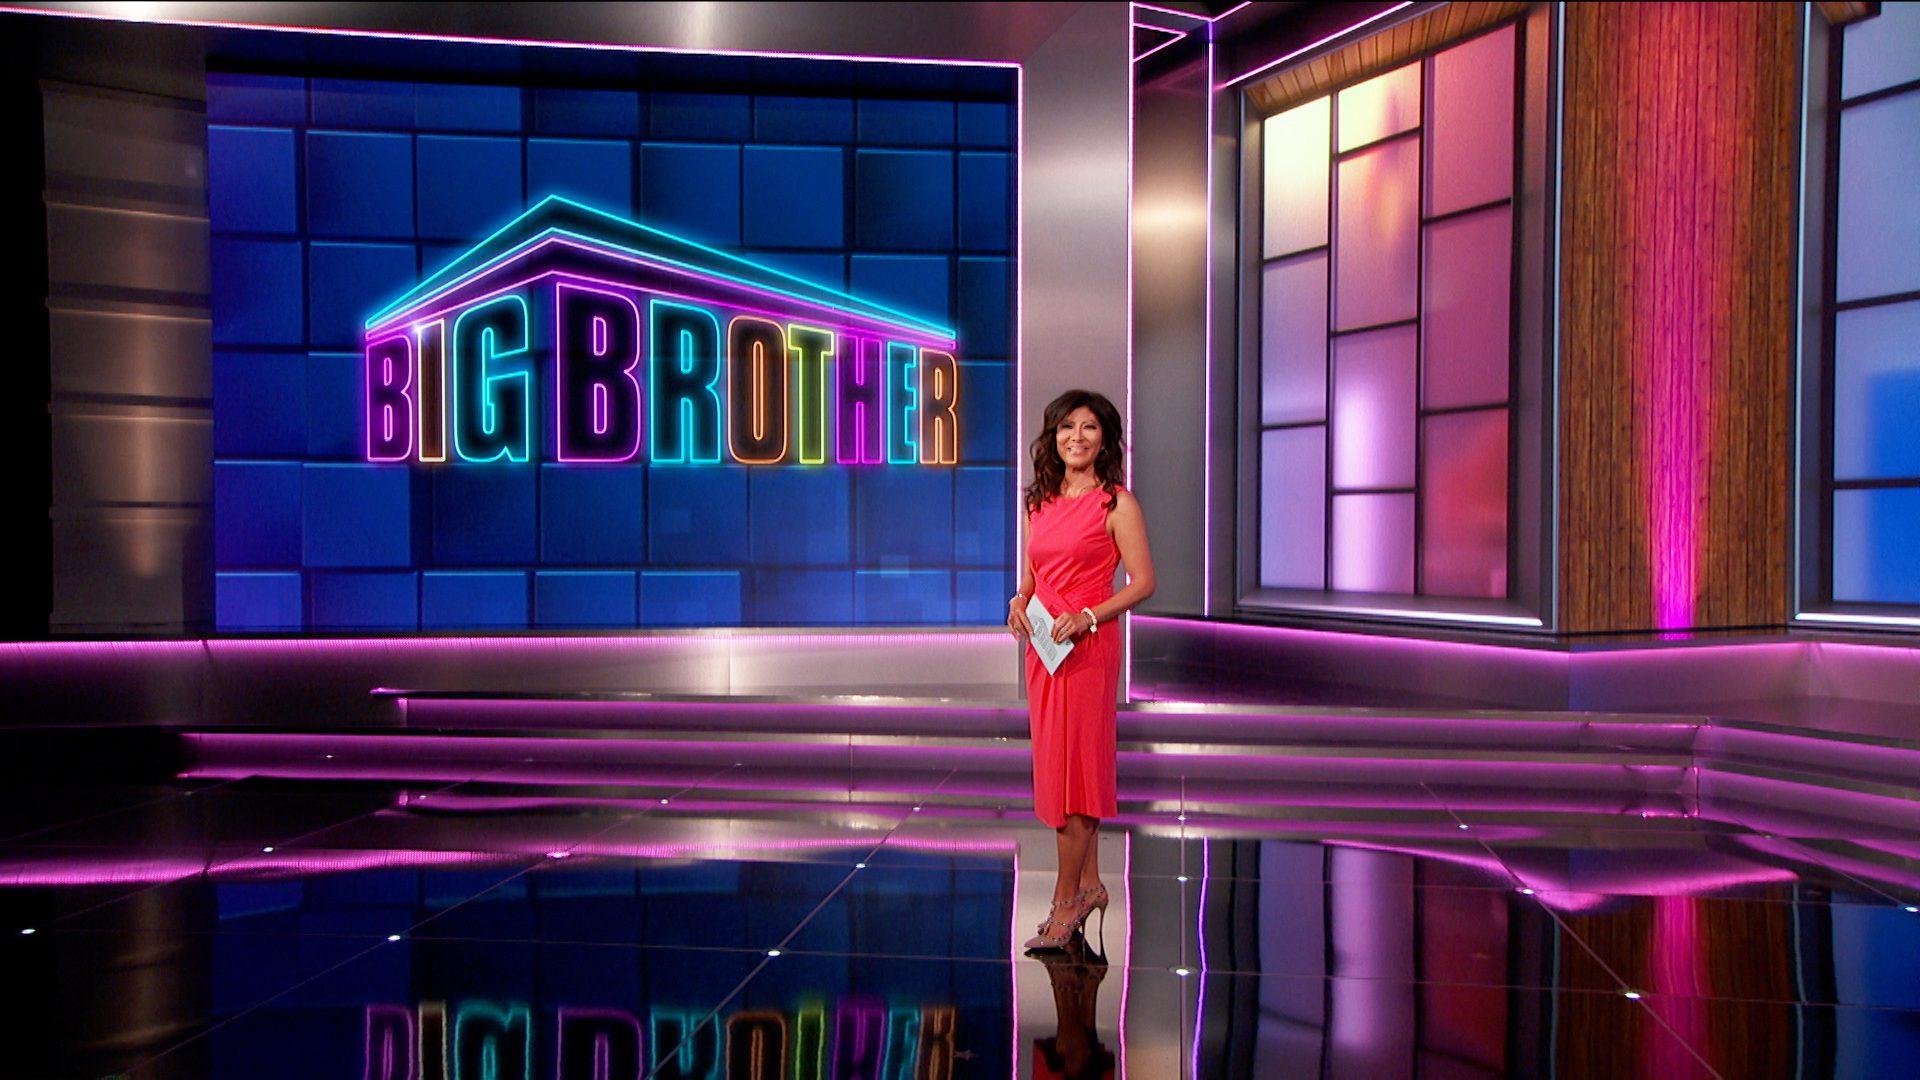 Big Brother Season 23 Episode 23